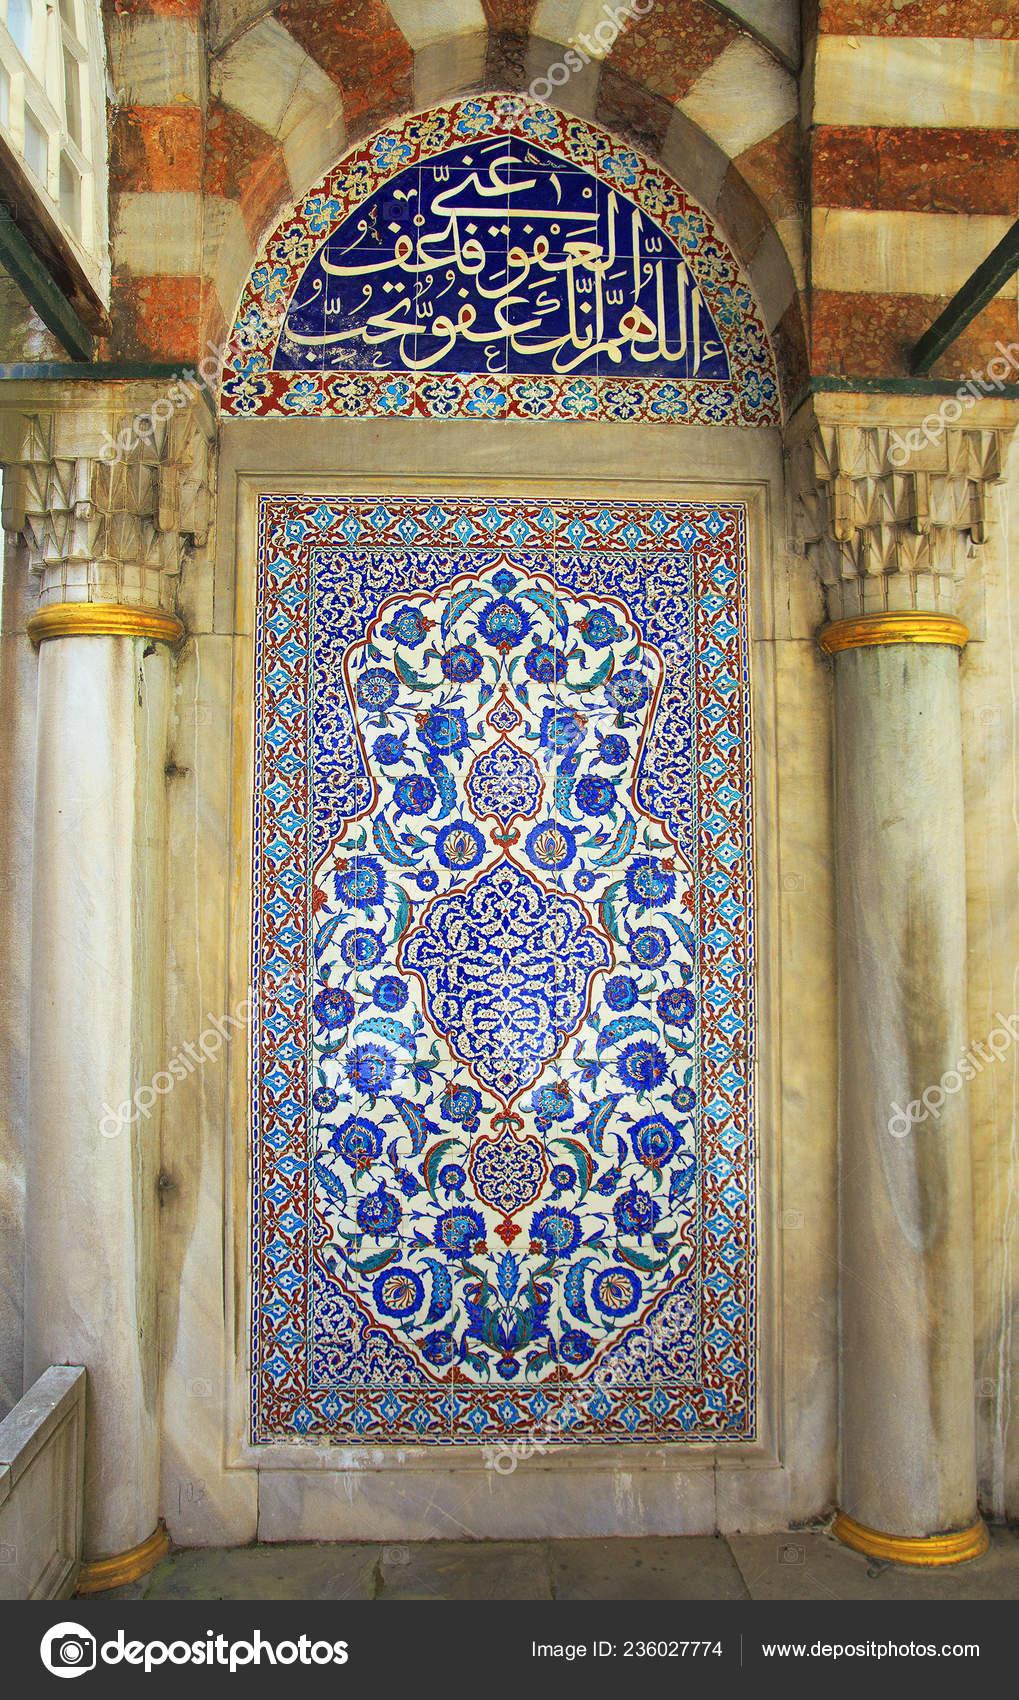 Traditional Turkish Ceramics Artistic Wall Tile Ornament Ancient Handmade Turkish Stock Photo C Ukrolenochka 236027774